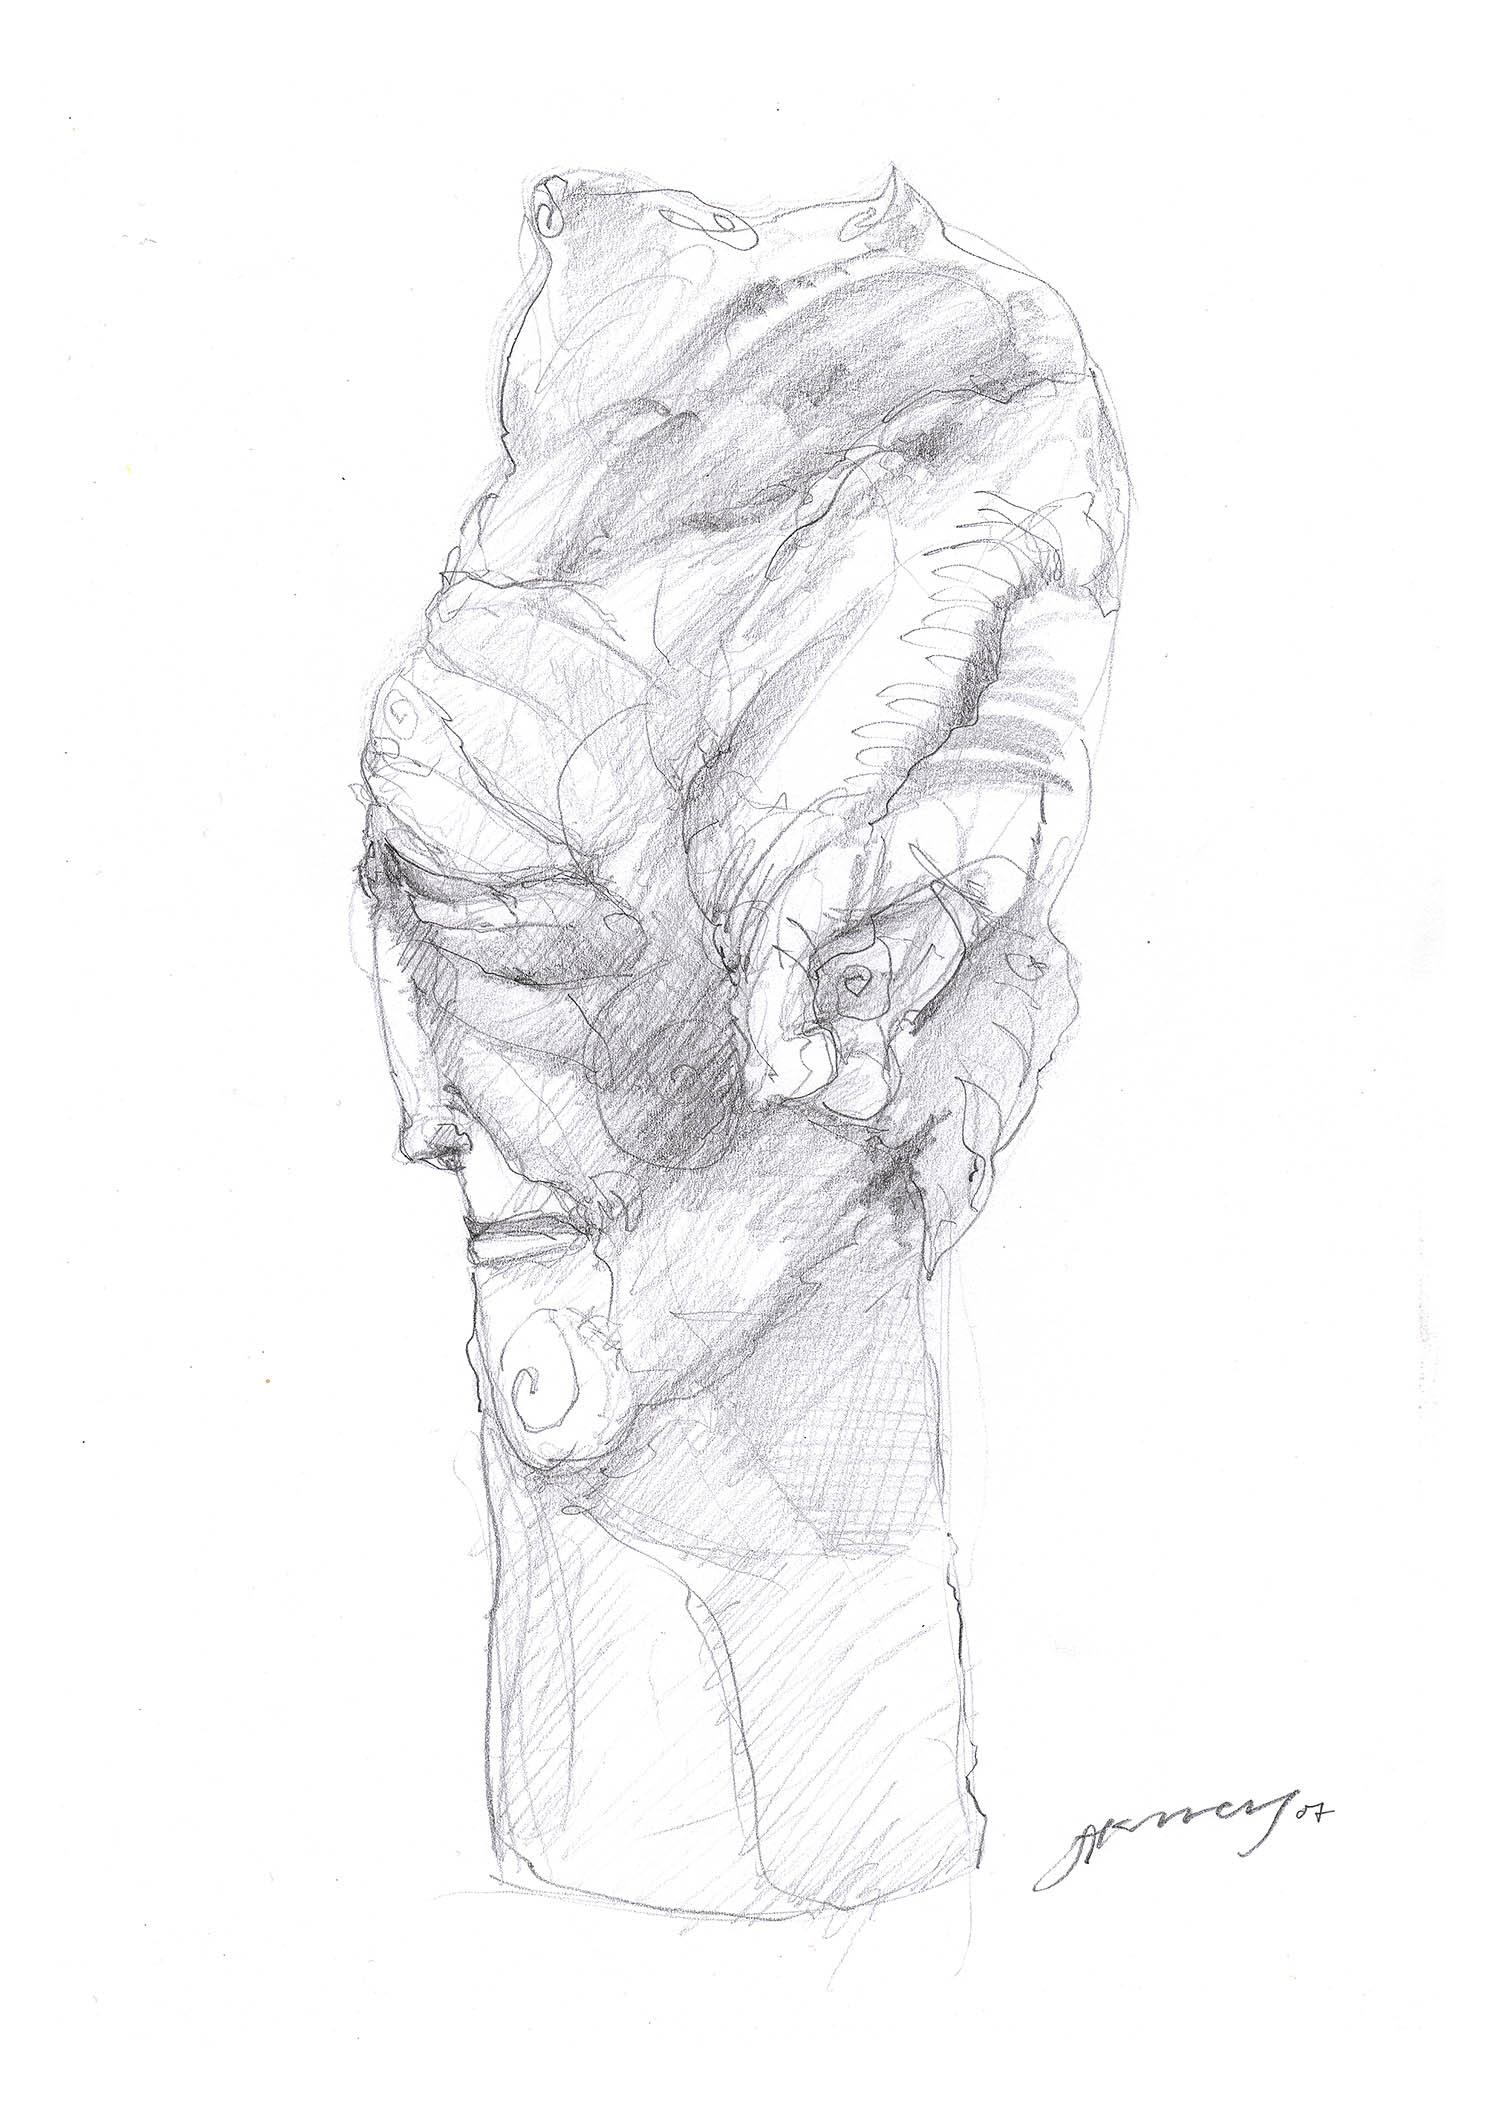 'Aristocratic Long Portrait 1', a modernist pencil portrait drawing by Greek multidisciplinary artist Kostas Gogas.